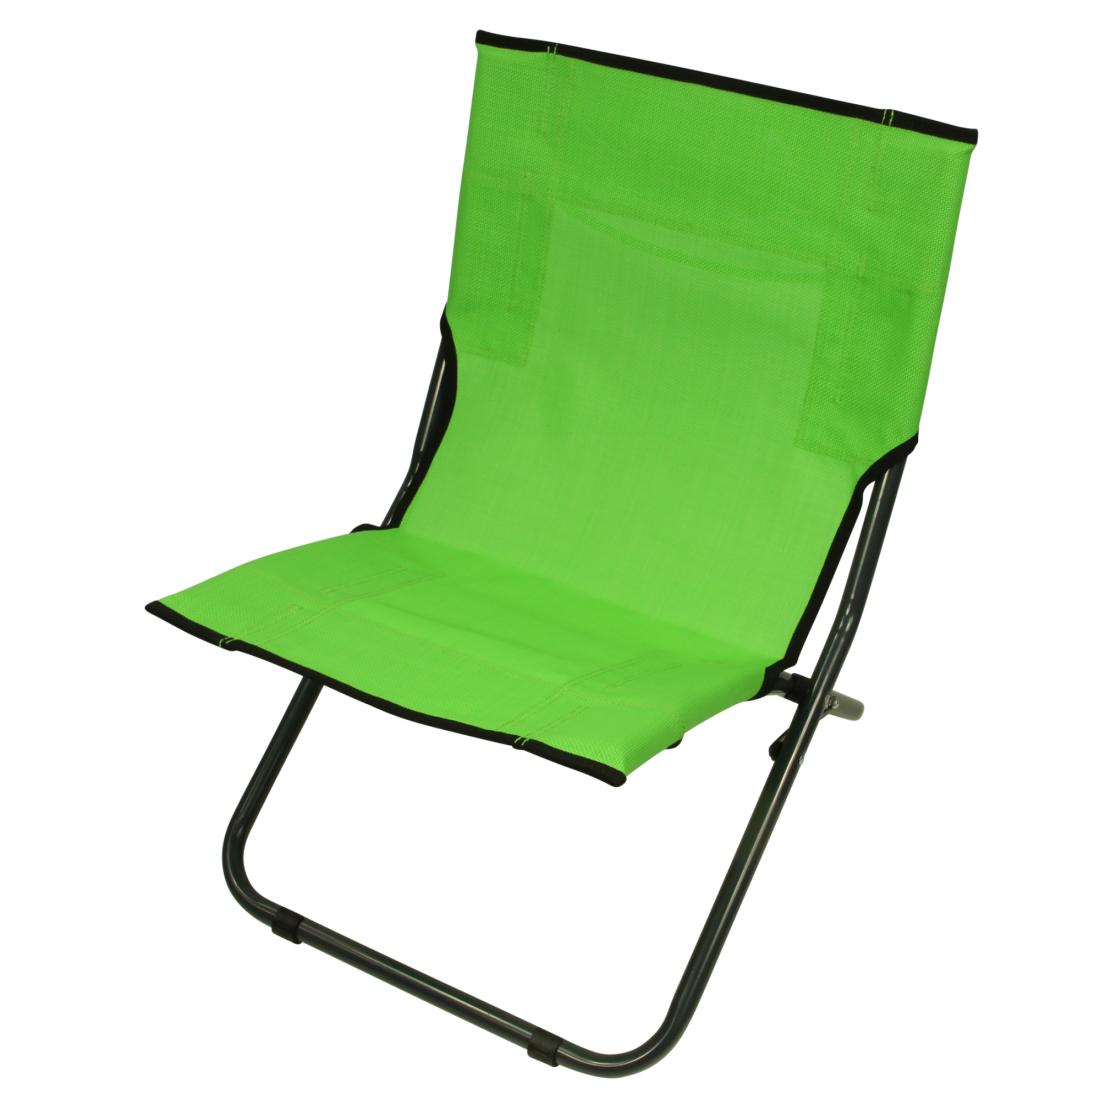 Beach lounge chair png - Fridani Bcg 620 Mobile Camping Chair Beach Chair Foldable Textilene 3300g Fridani Bcg 620 Mobile Camping Chair Beach Chair Foldable Textilene